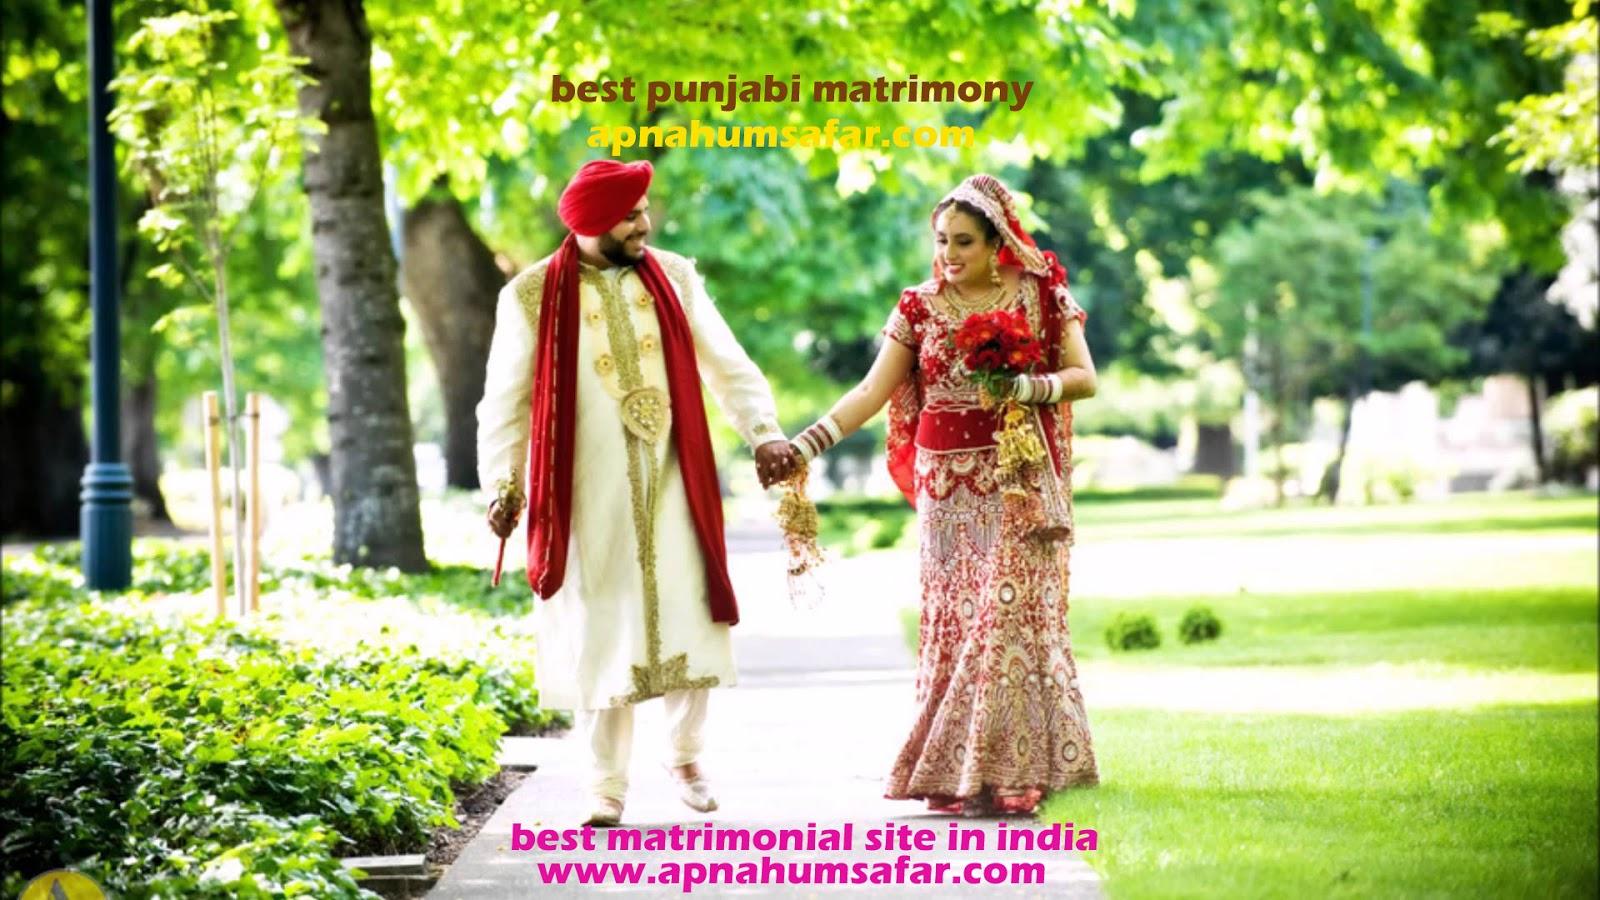 best matrimonial website in